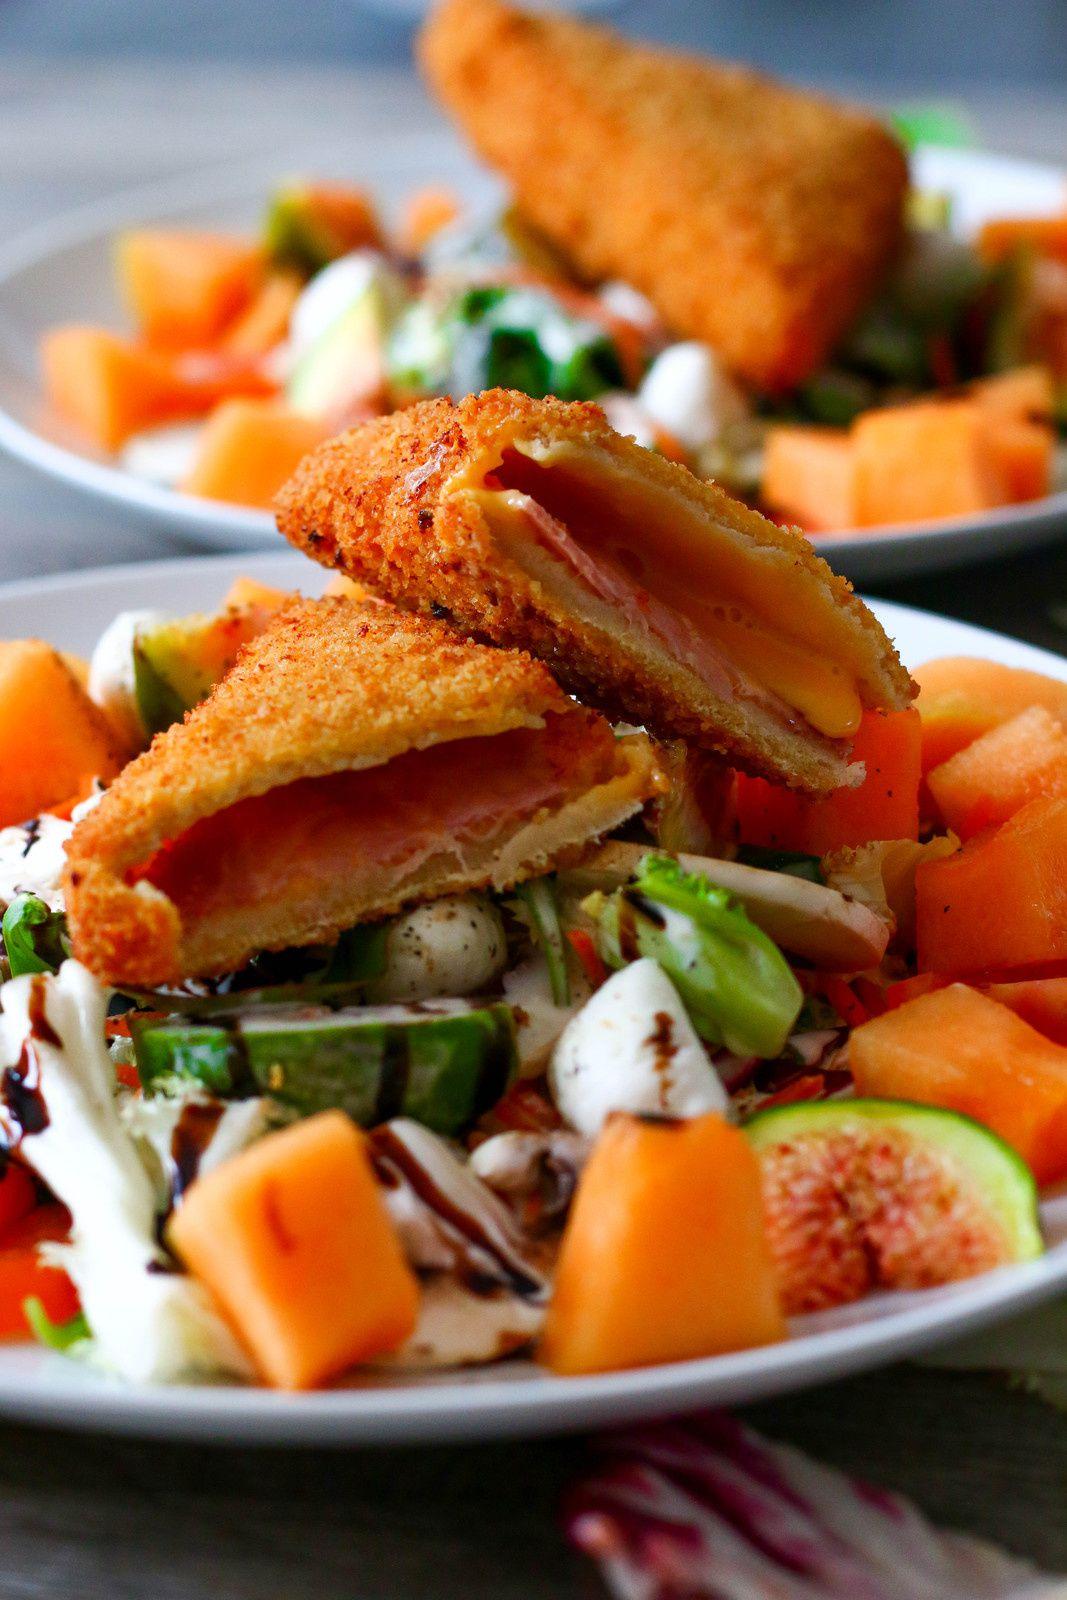 Salade composée sucrée/salée & croque-monsieur revisité